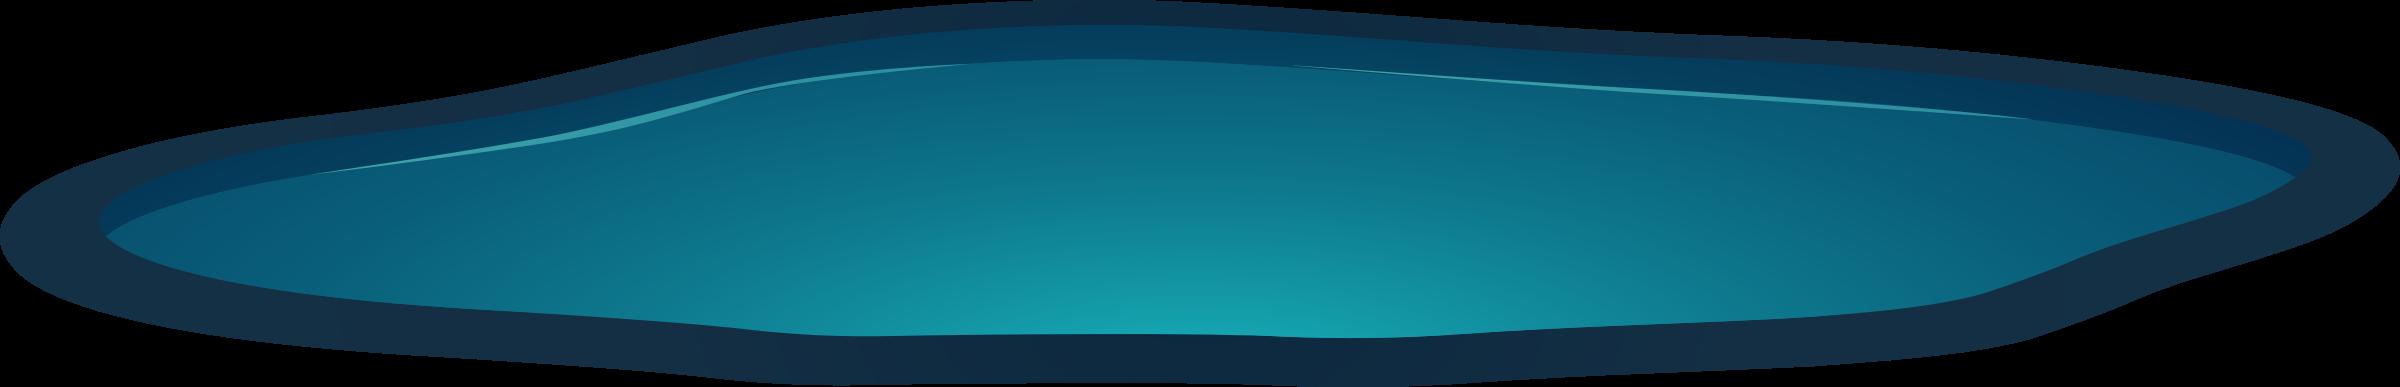 Ilmenskie topper b z. Lake clipart icon